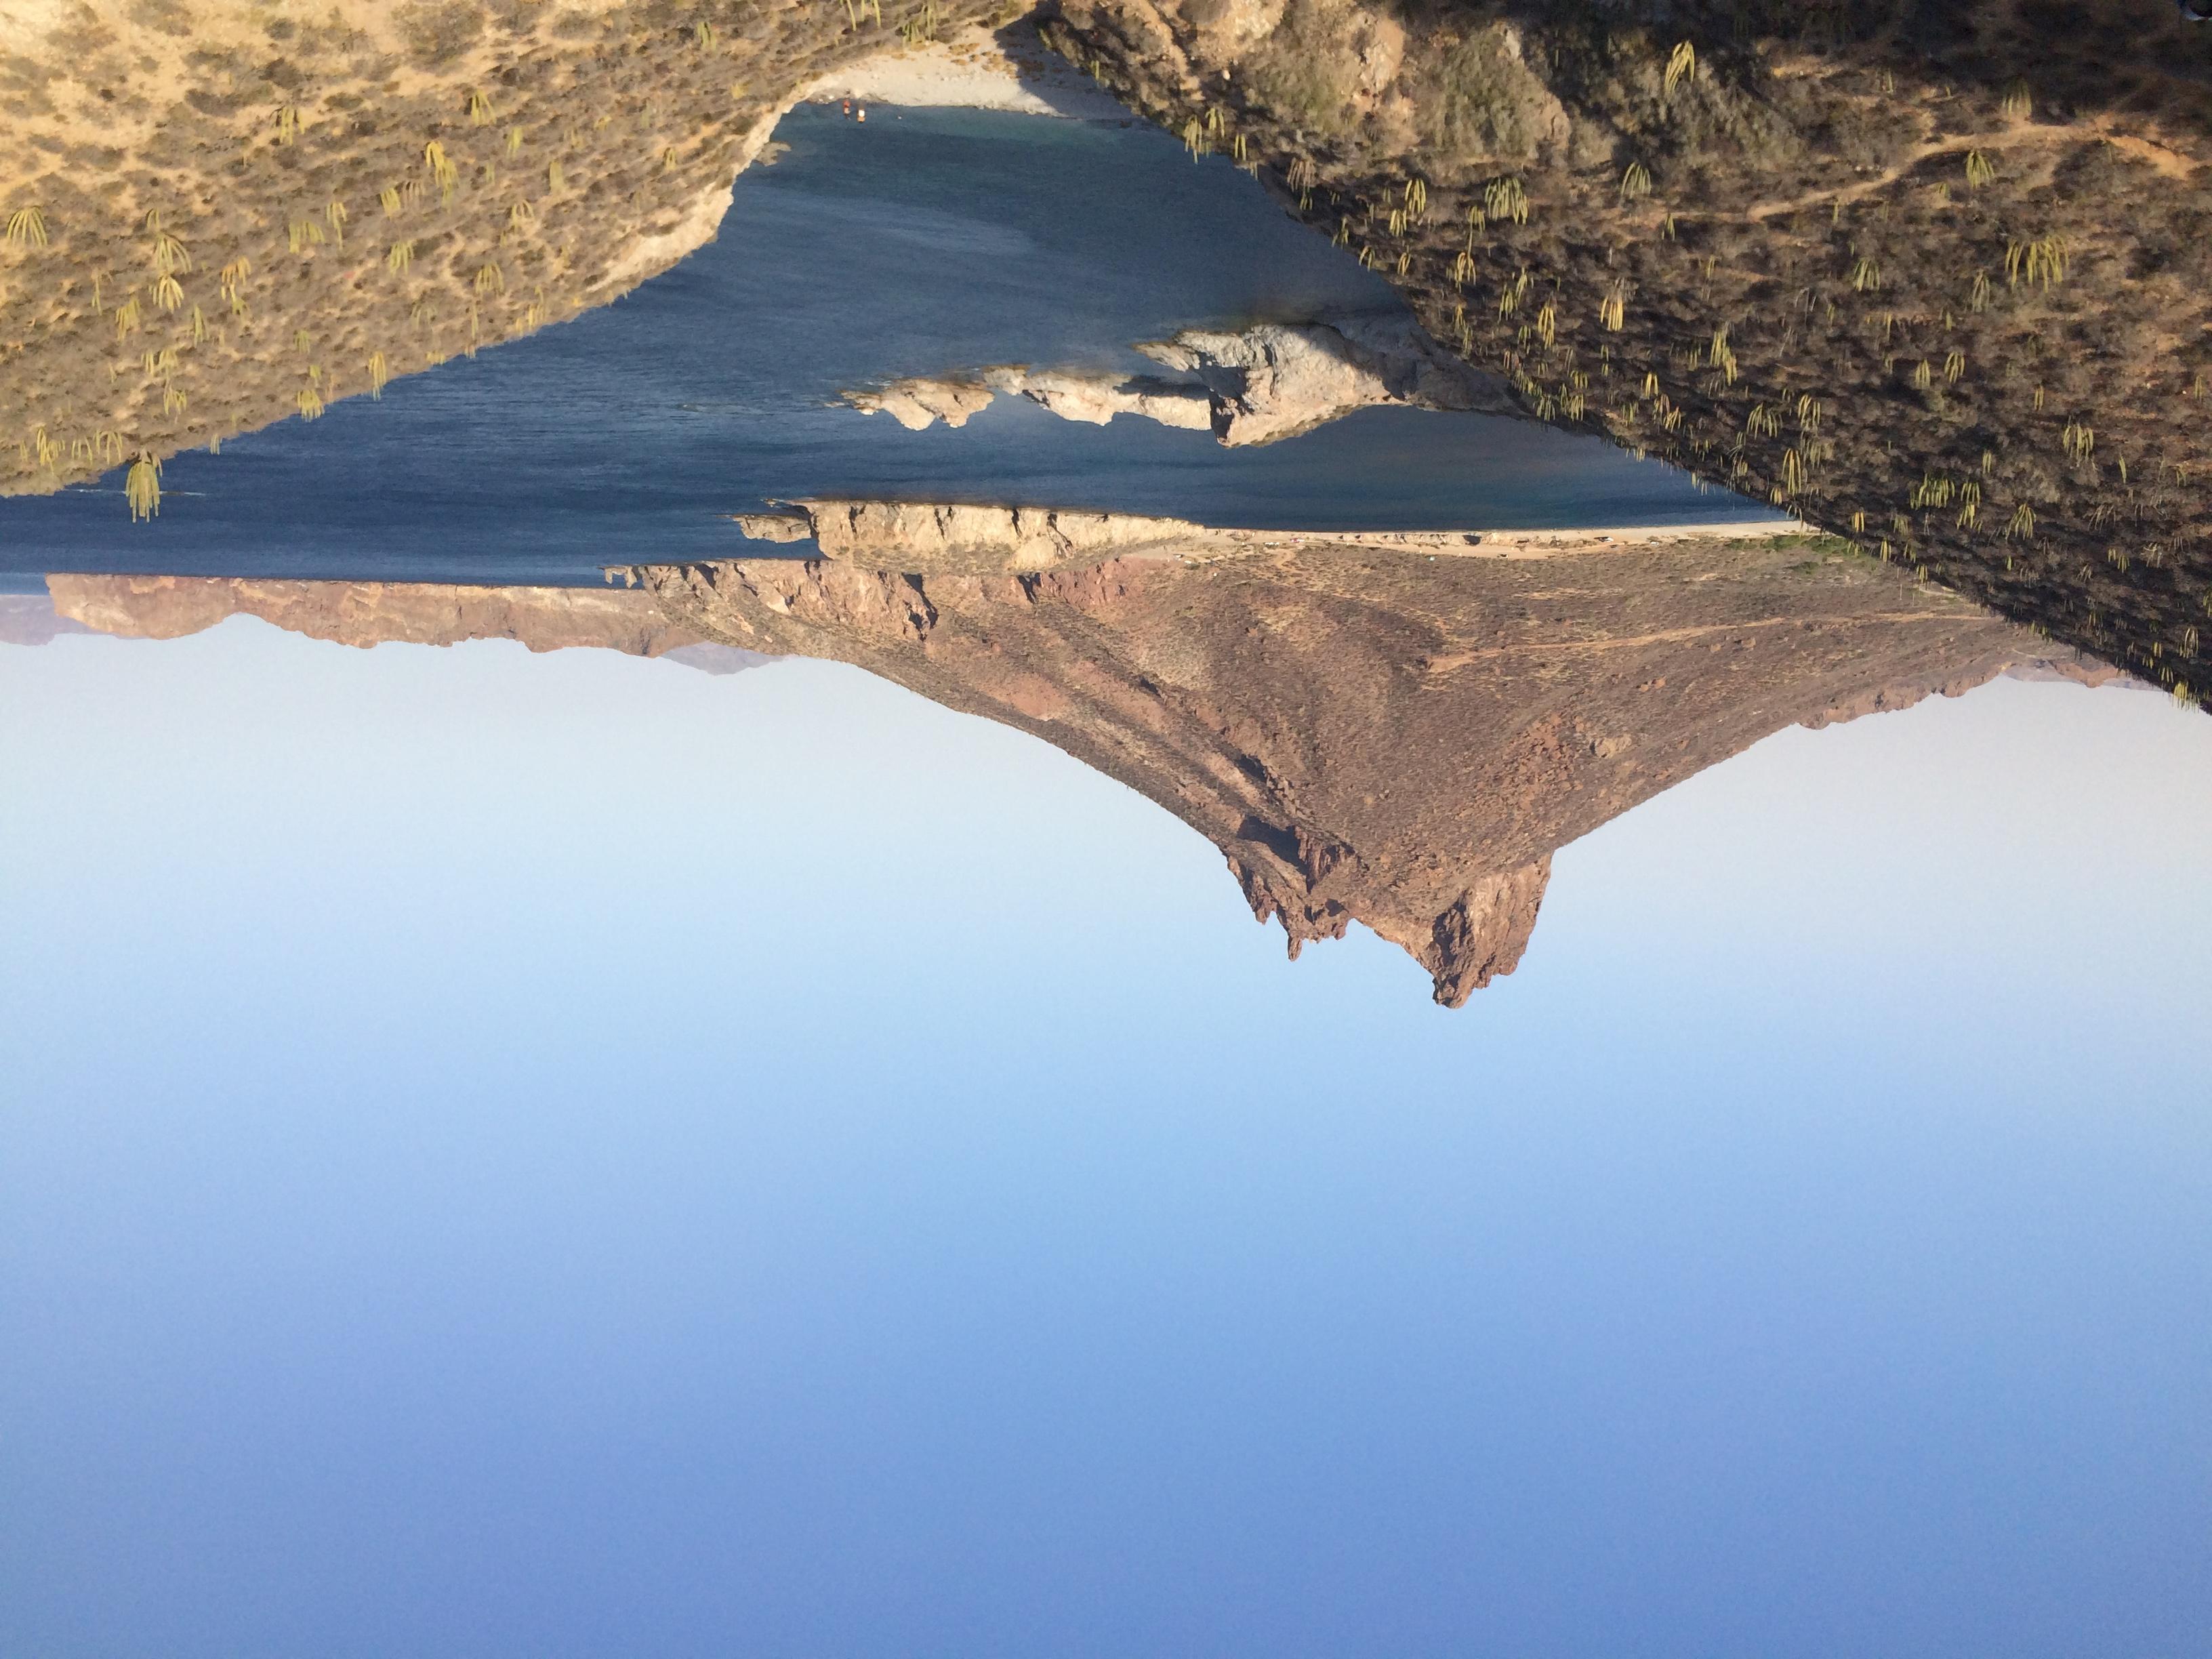 Cerro-Tetakawi-Guaymas-Sonora